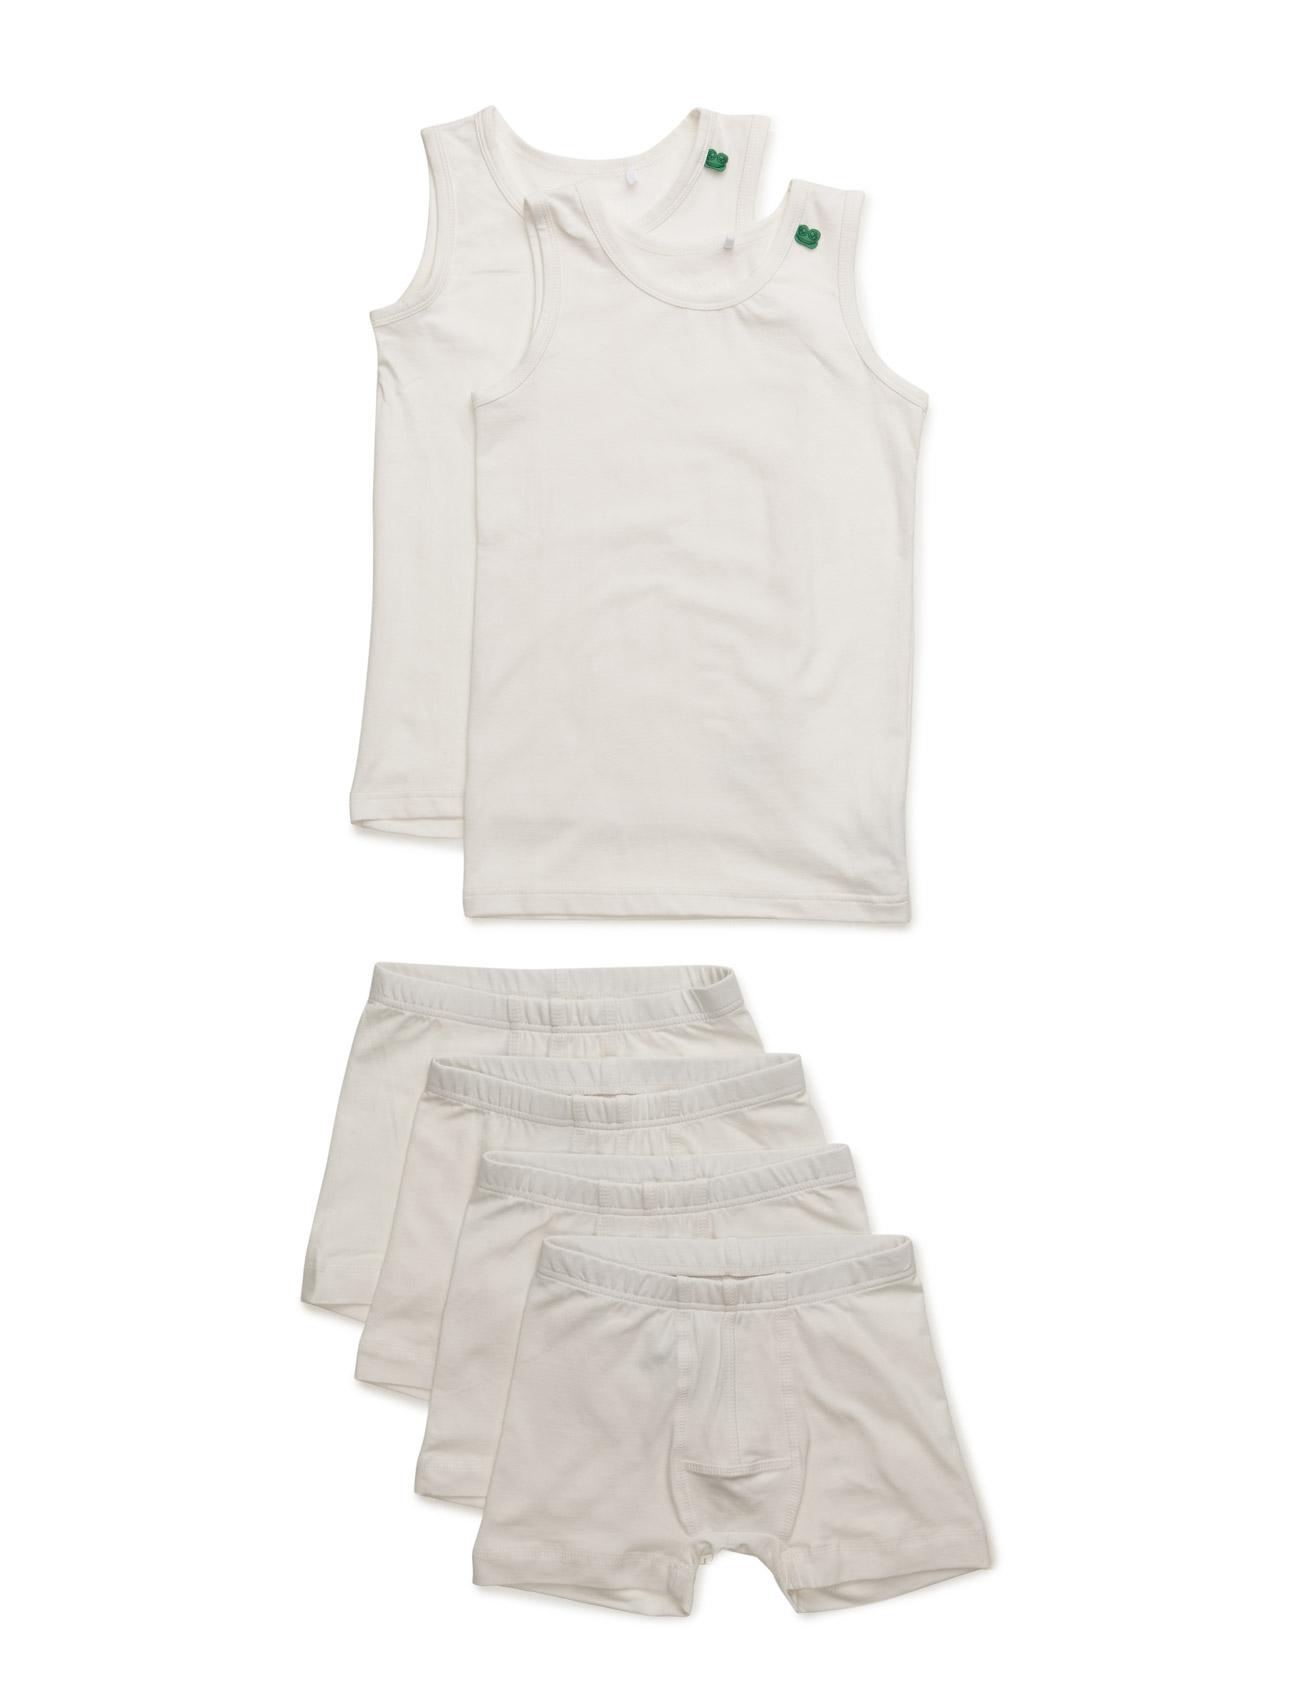 Alfa Underwear Boy 2-Pack Freds World Undertøj til Børn i